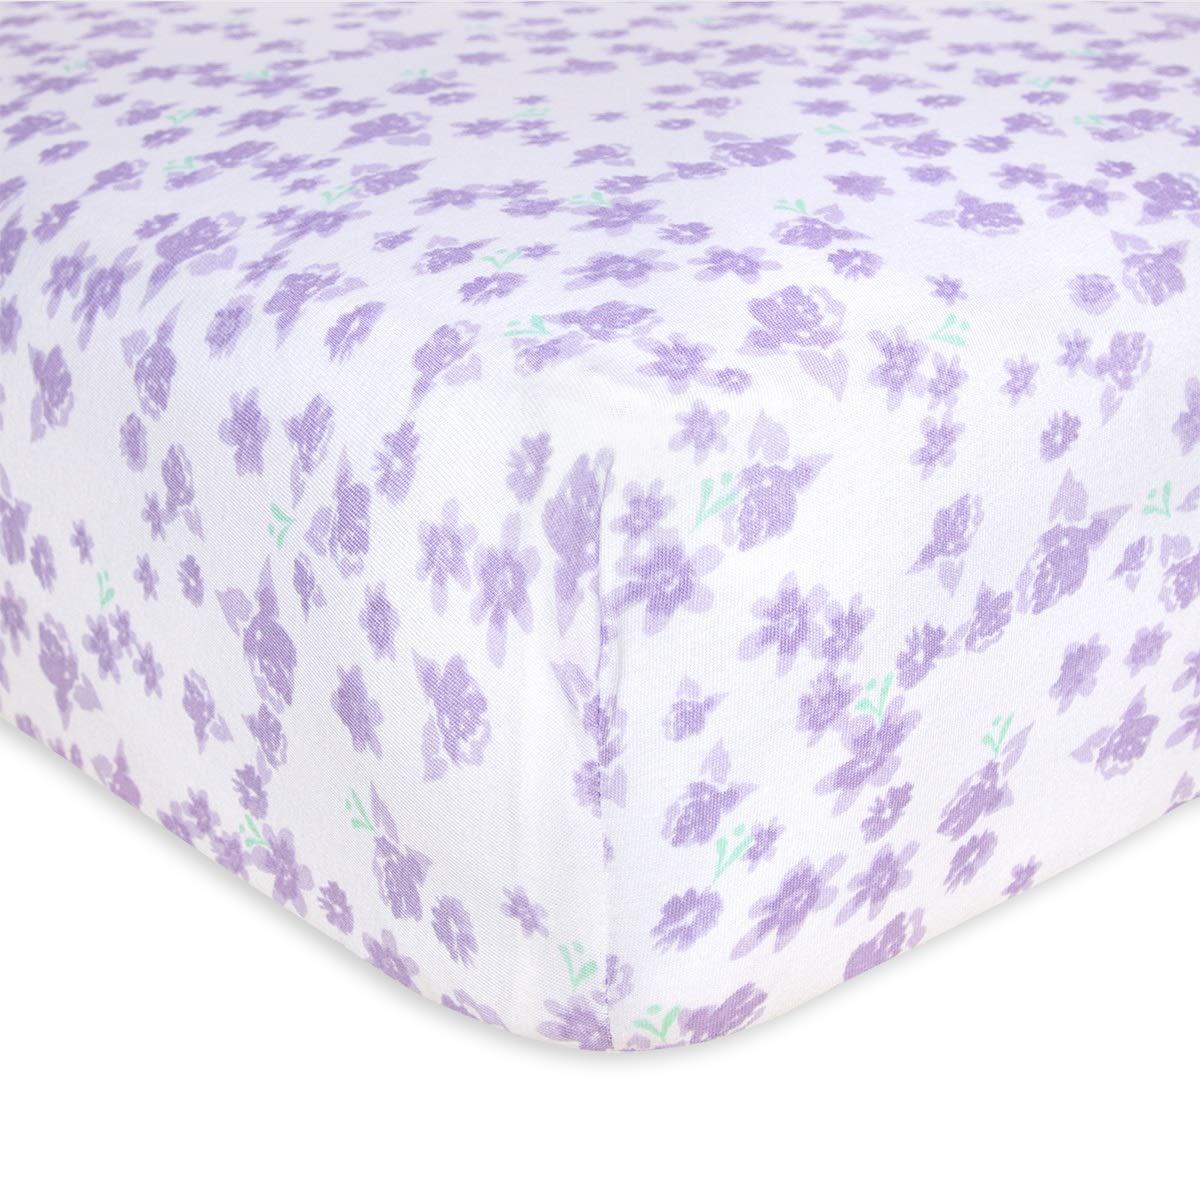 Burt's Bees Baby - Fitted Crib Sheet, Girls & Unisex 100% Organic Cotton Crib Sheet for Standard Crib and Toddler Mattresses (Purple Ditsy Rose Garden)